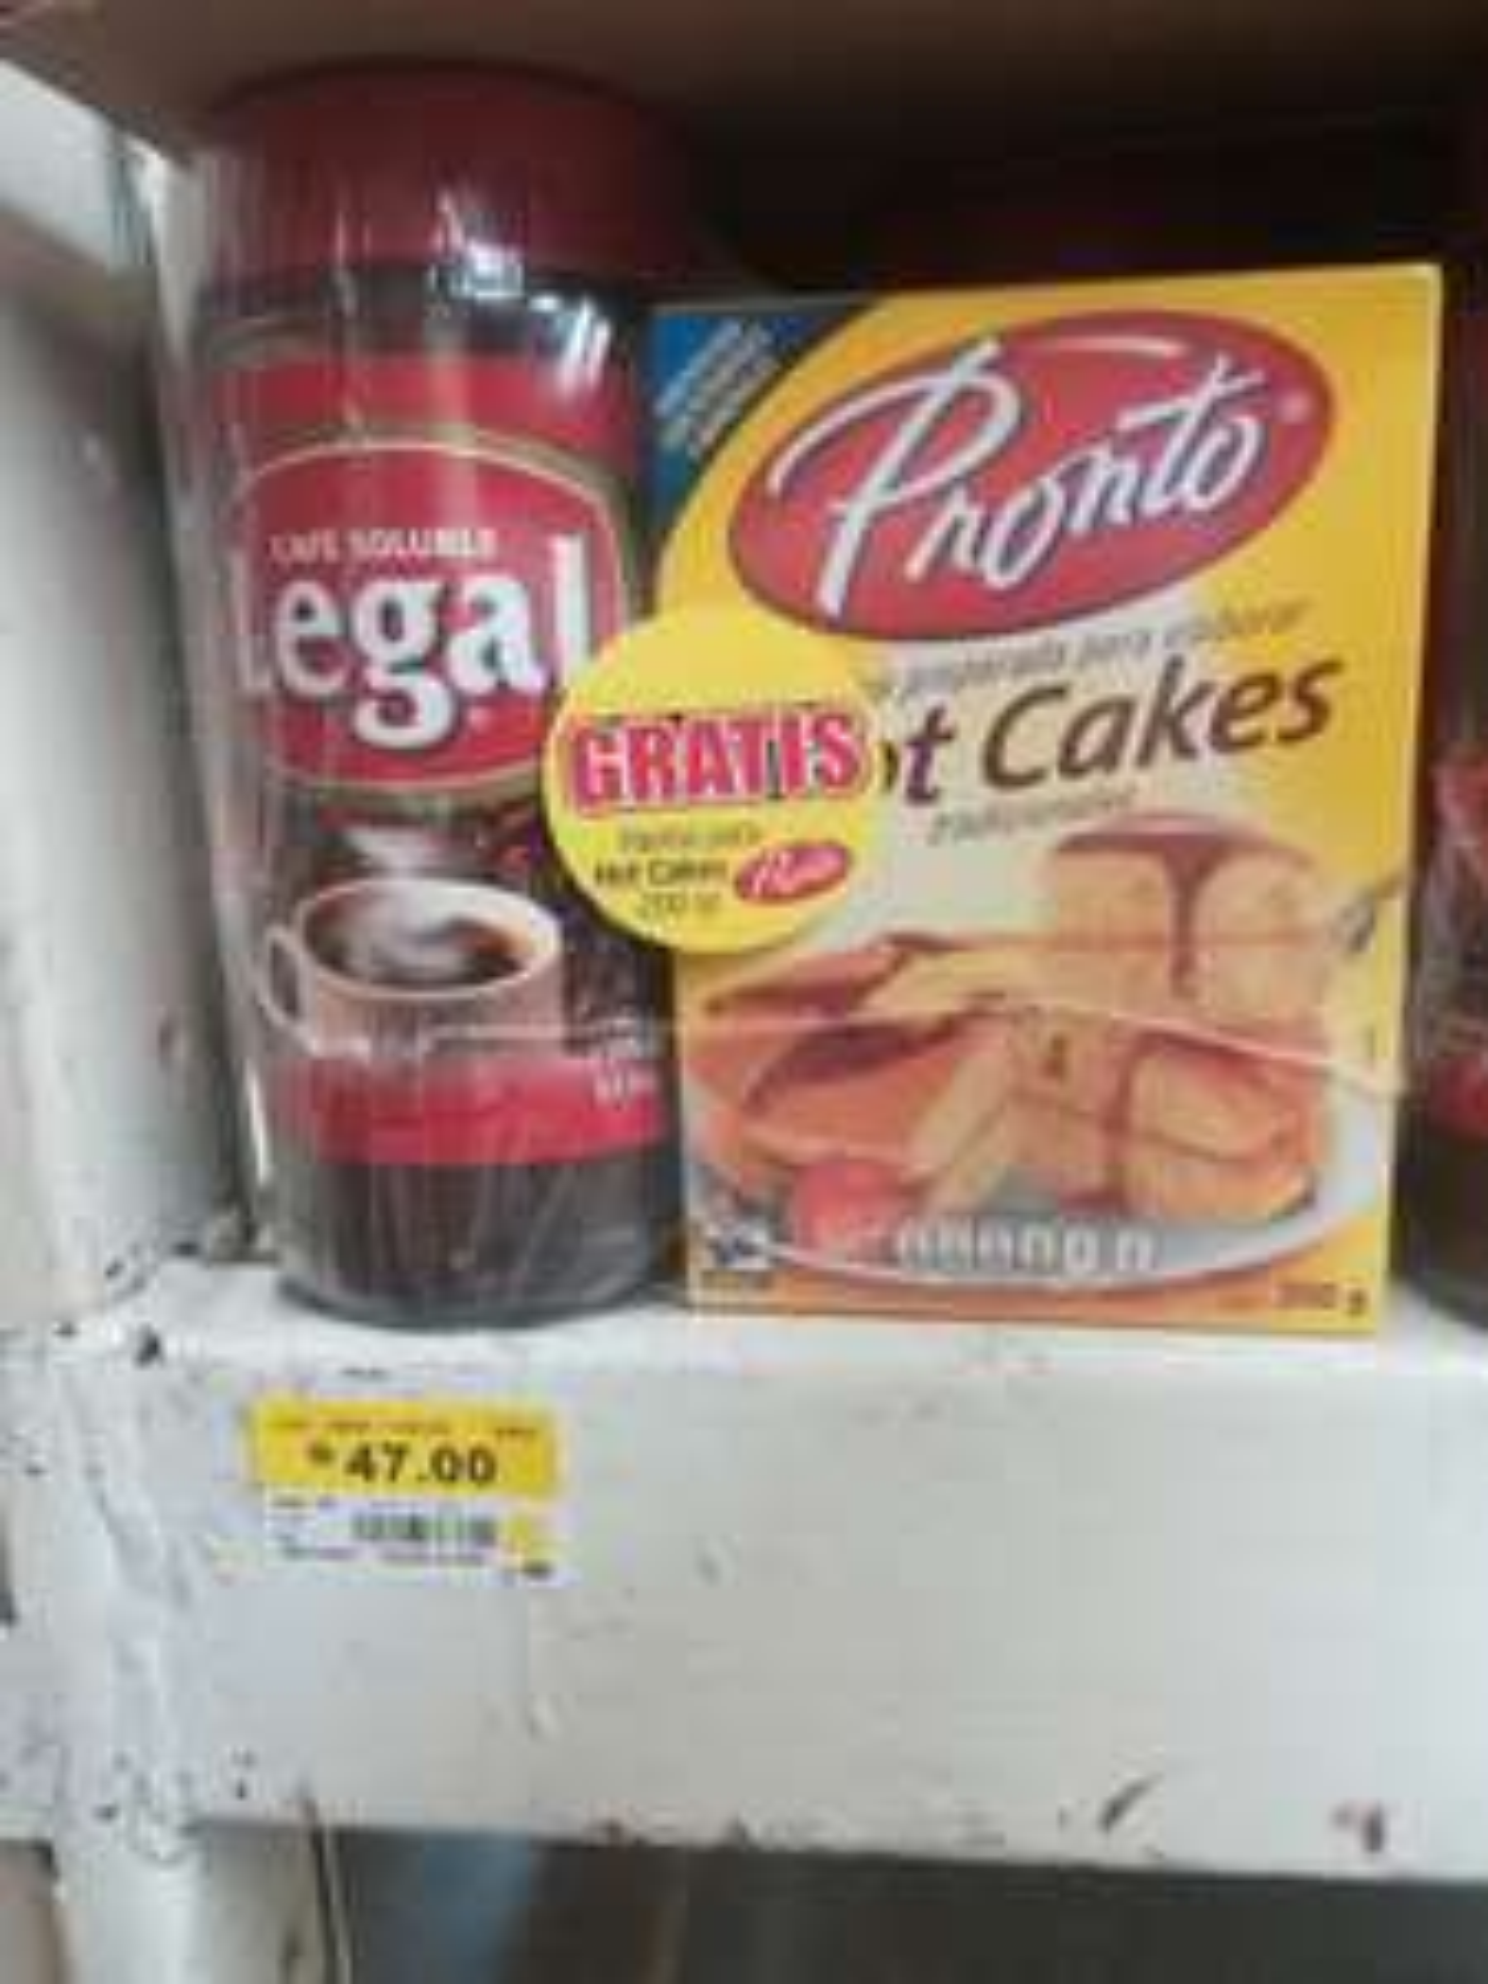 Bodega Aurrerá: gratis harina para hotcakes en la compra de café legal